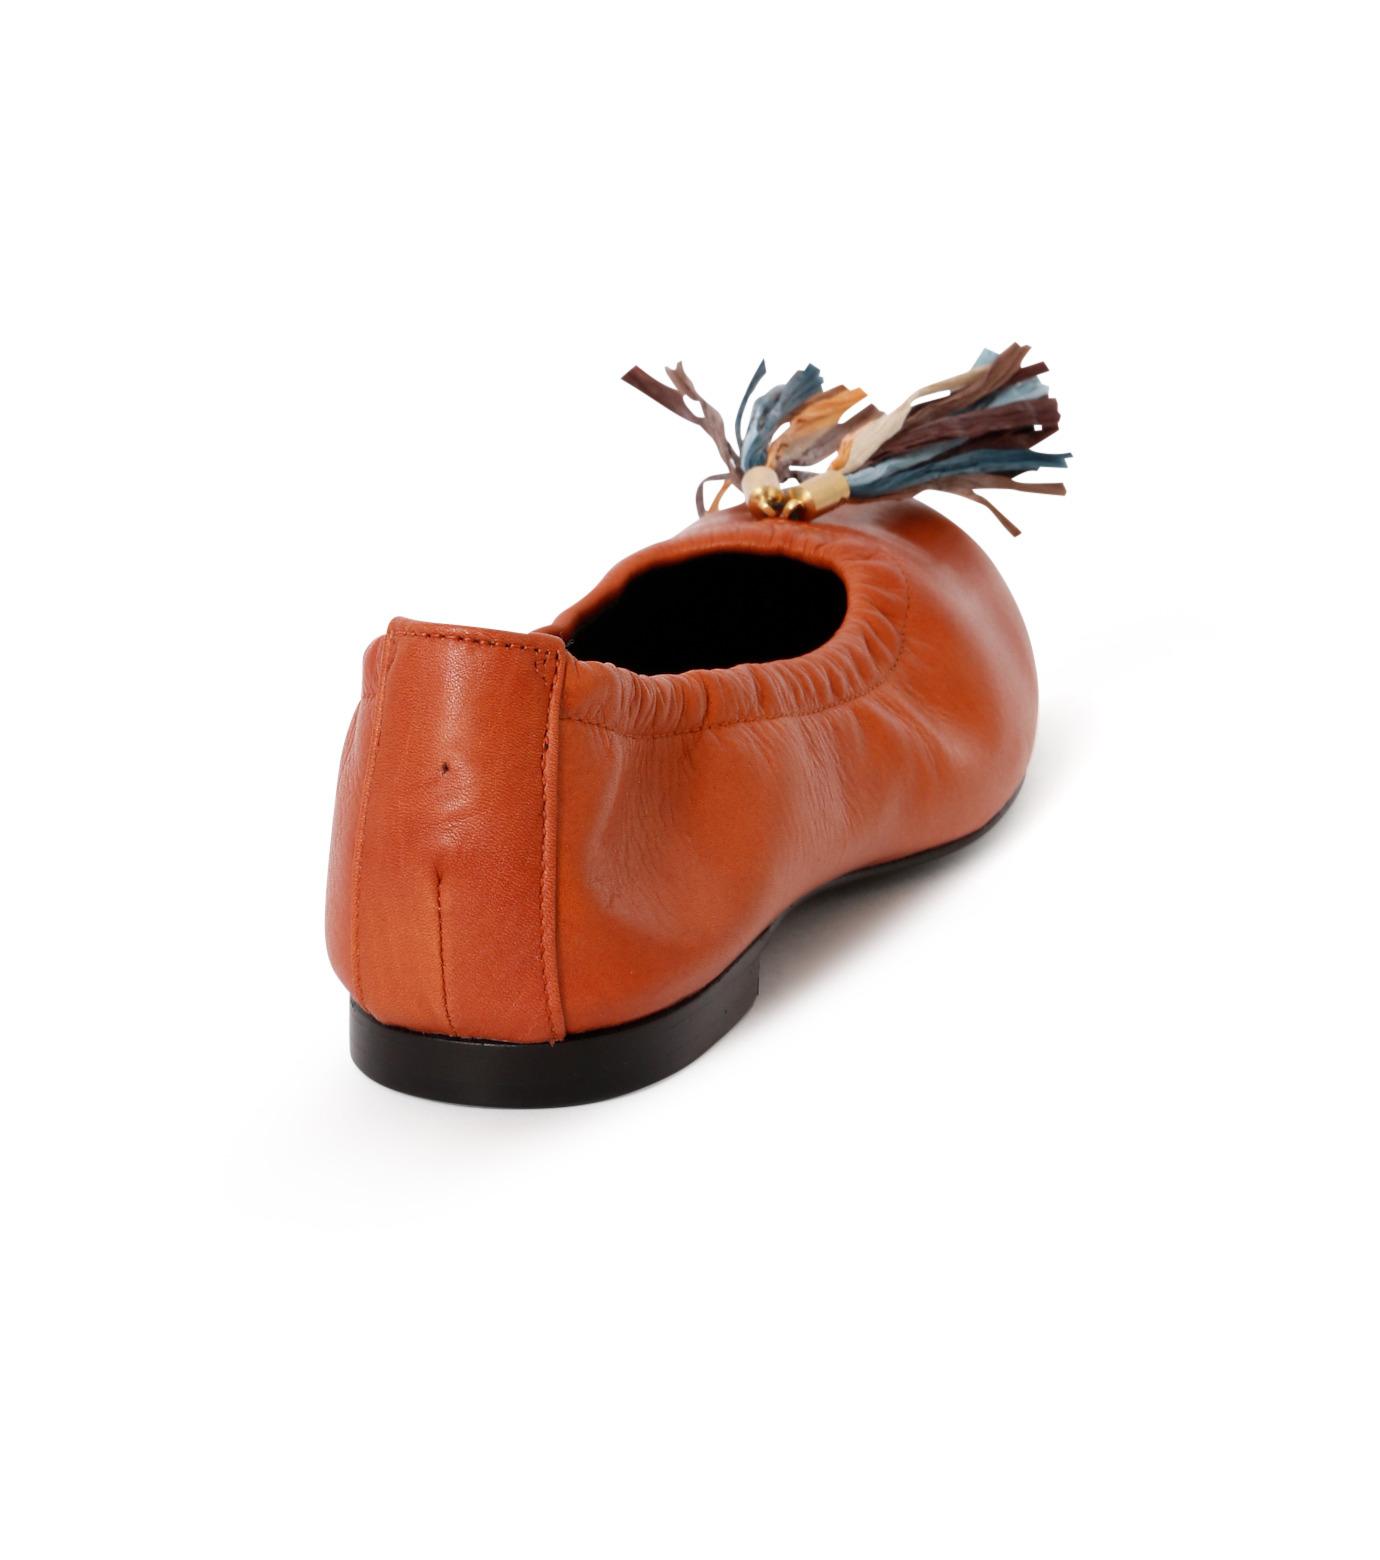 PIPPICHIC(ピッピシック)のballet shoes-DARK BROWN(シューズ/shoes)-PP16BALLET19-43 拡大詳細画像3